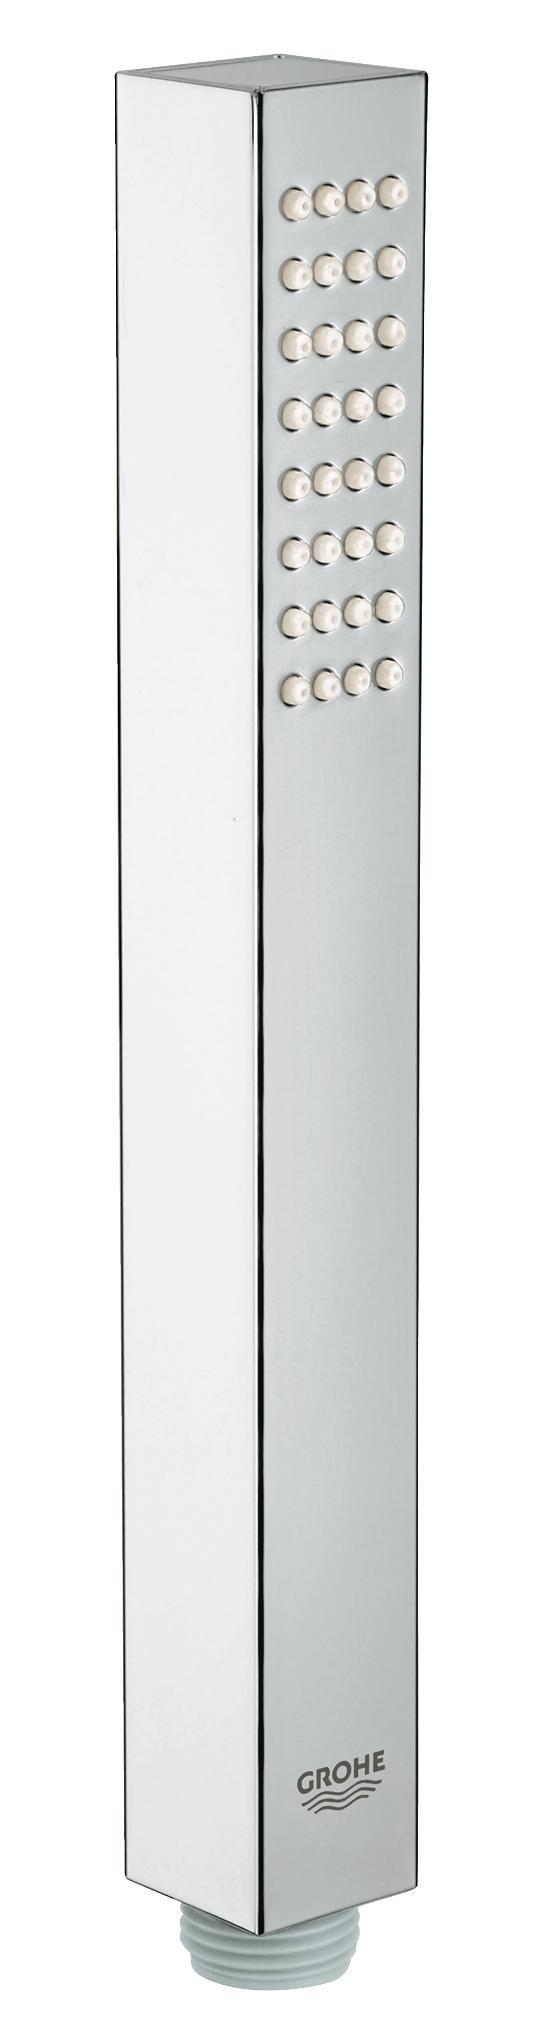 Купить Ручной Душ Grohe Euphoria Cube (1 Режим) 27698000